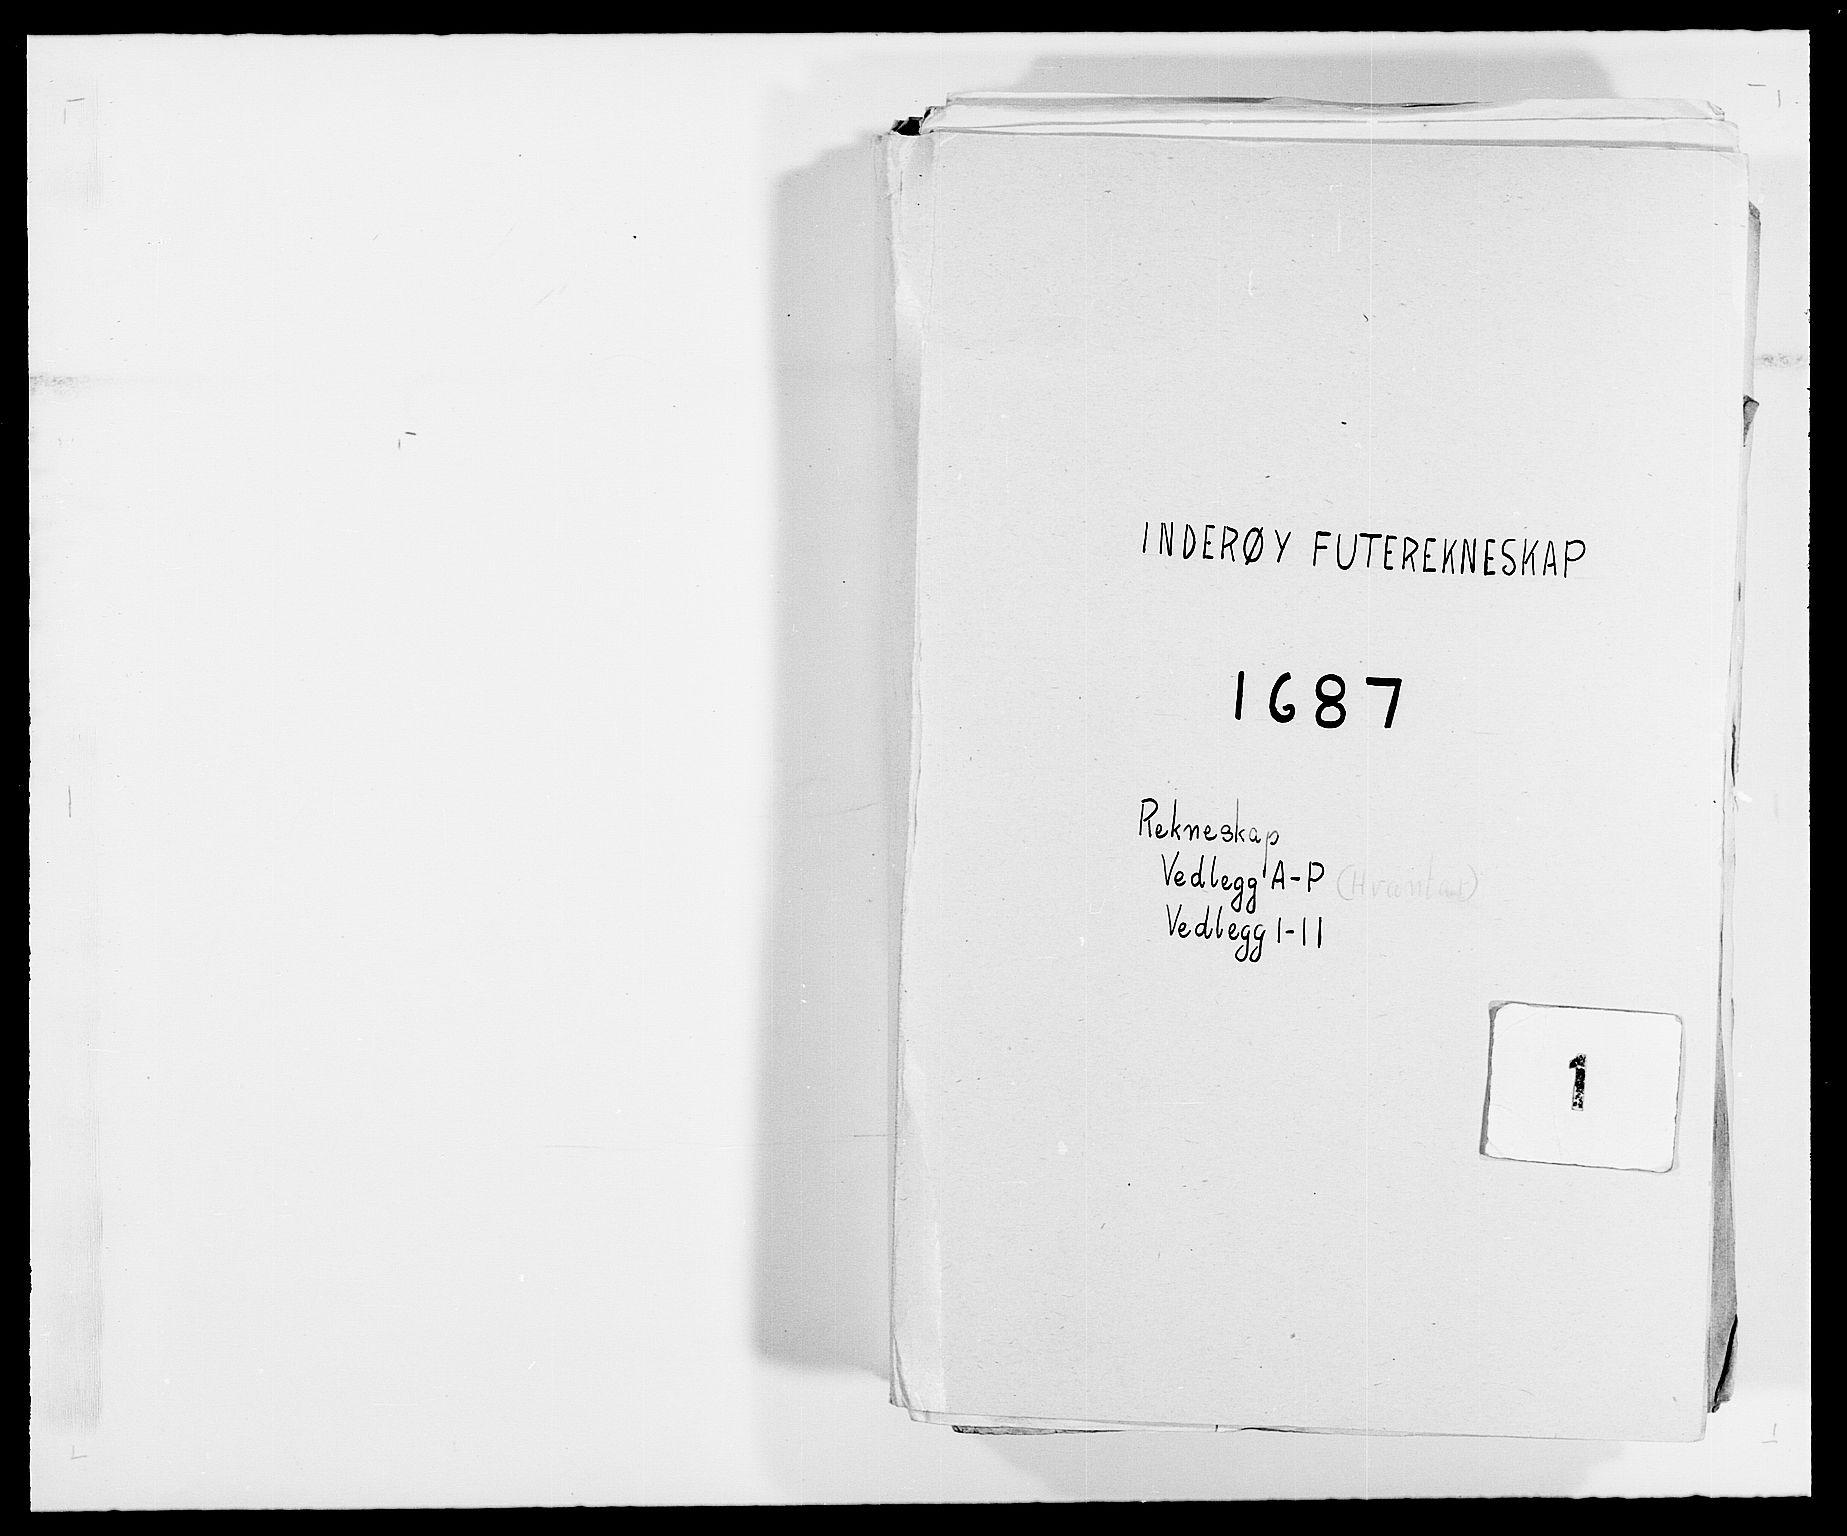 RA, Rentekammeret inntil 1814, Reviderte regnskaper, Fogderegnskap, R63/L4306: Fogderegnskap Inderøy, 1687-1689, s. 1